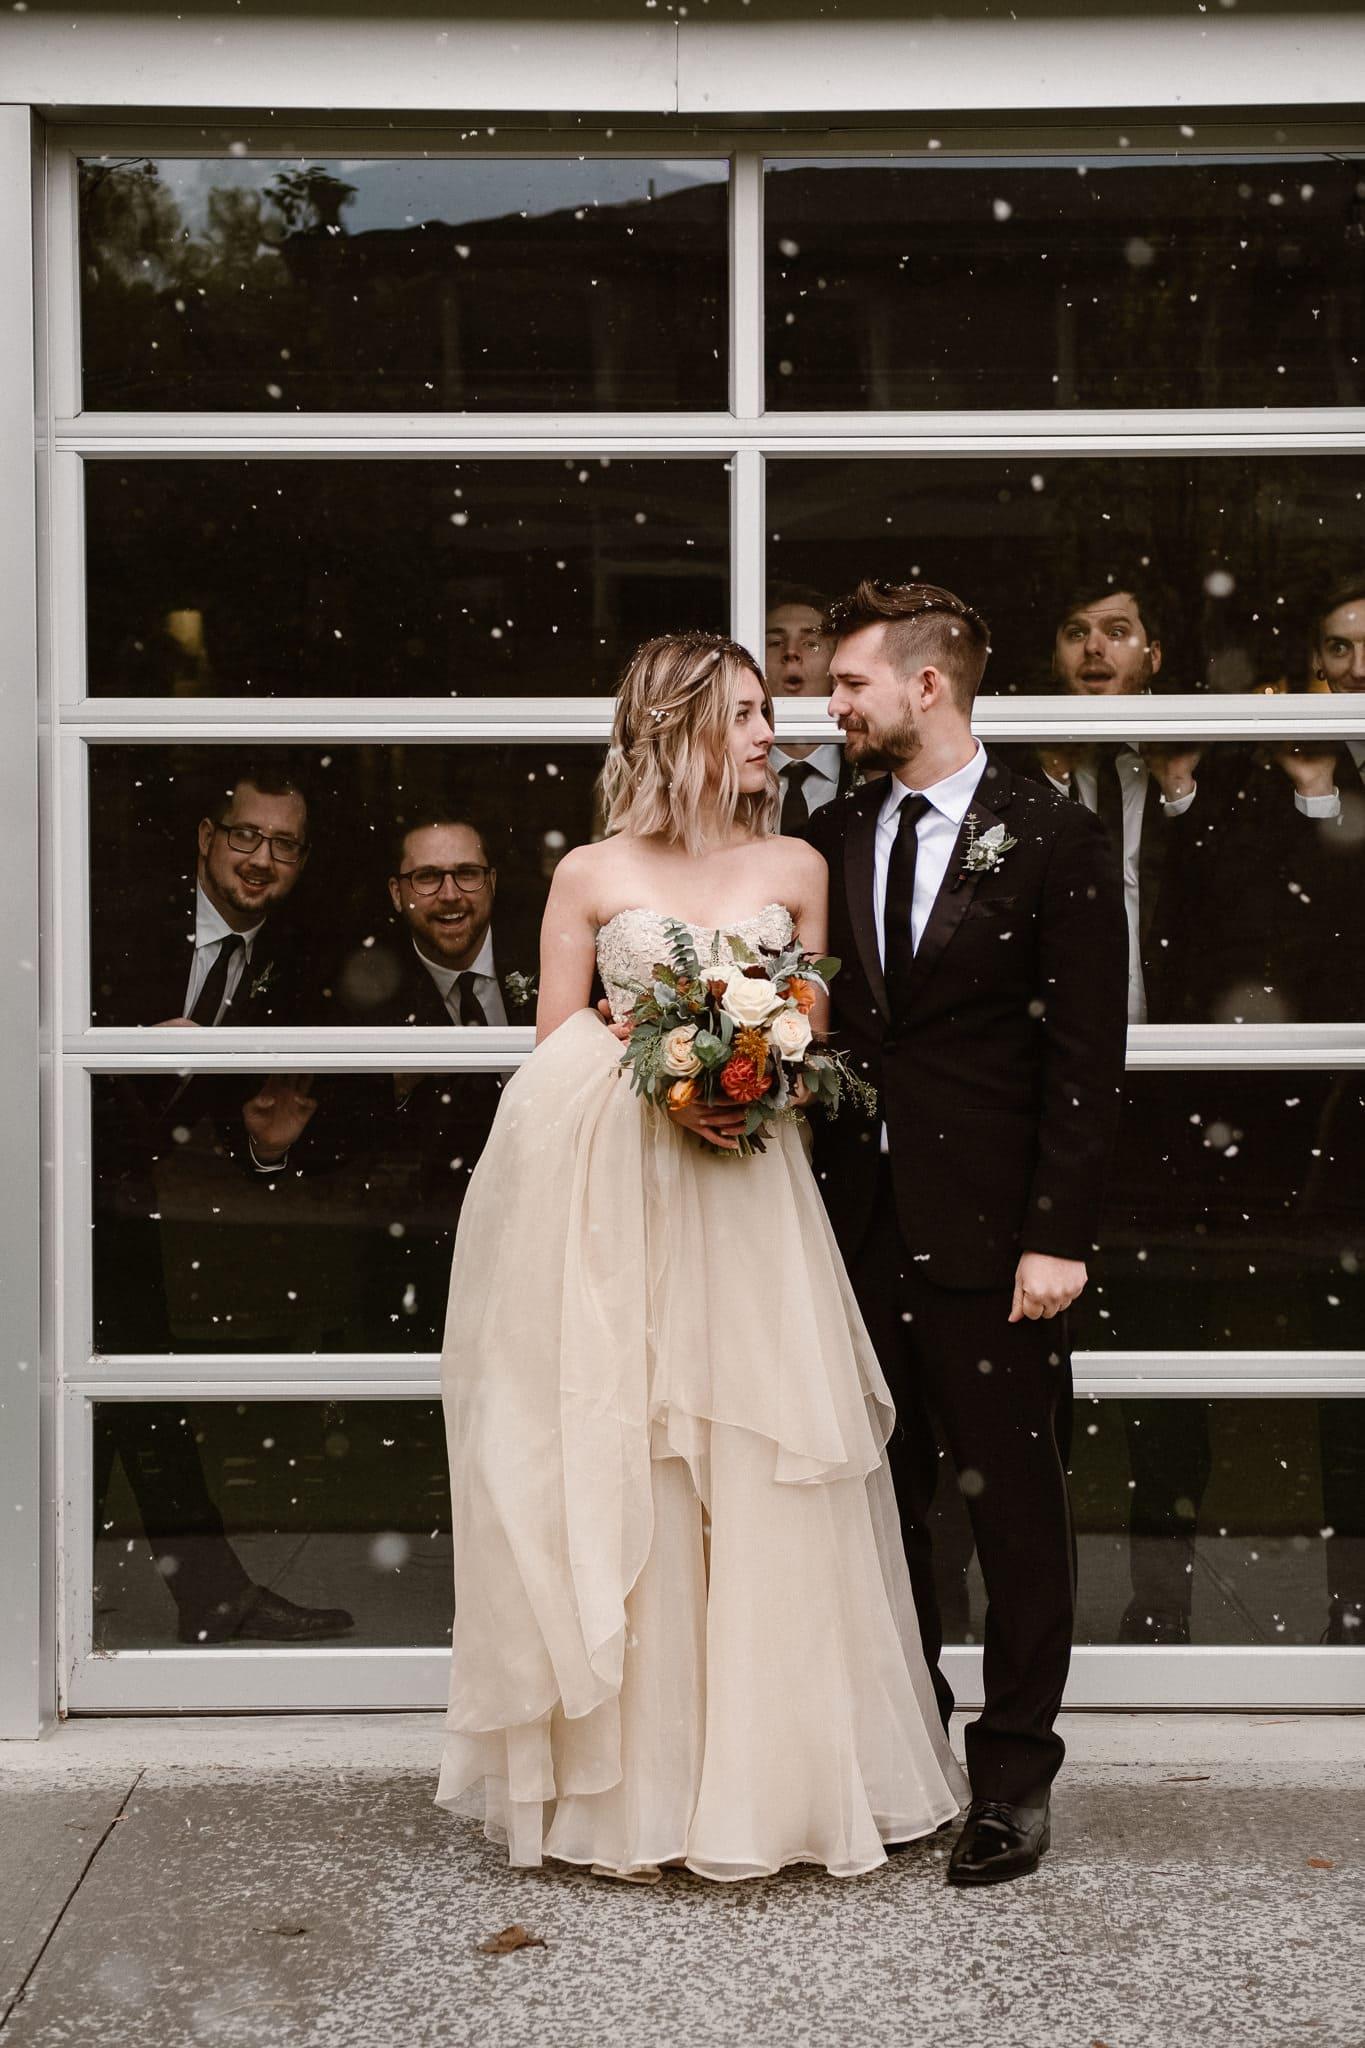 St Vrain Wedding Photographer   Longmont Wedding Photographer   Colorado Winter Wedding Photographer, Colorado industrial chic wedding, bride and groom portraits, silly groomsmen